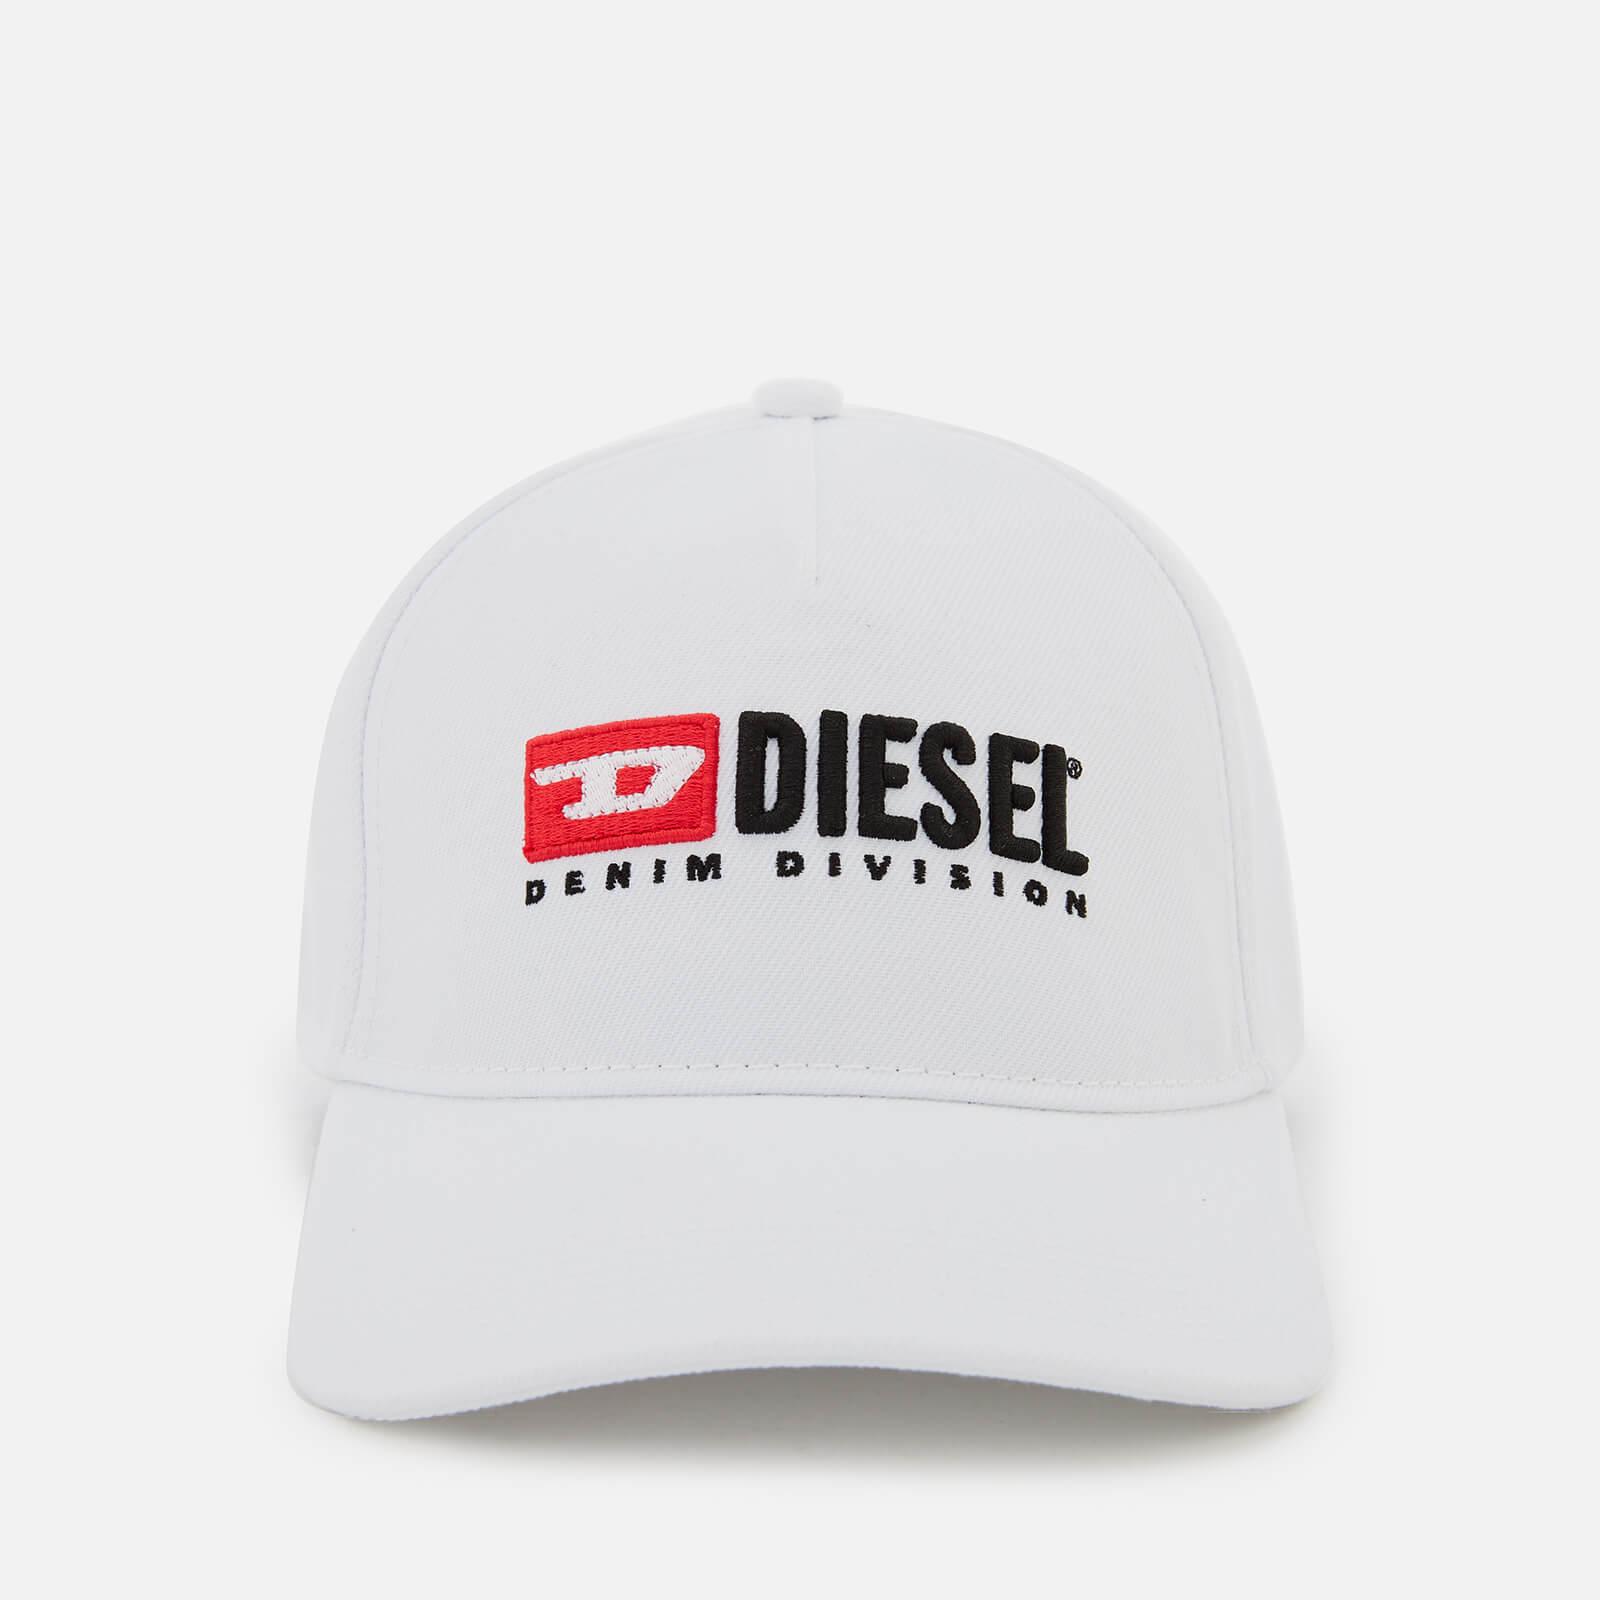 Diesel Men's Cakery Max Cap - White